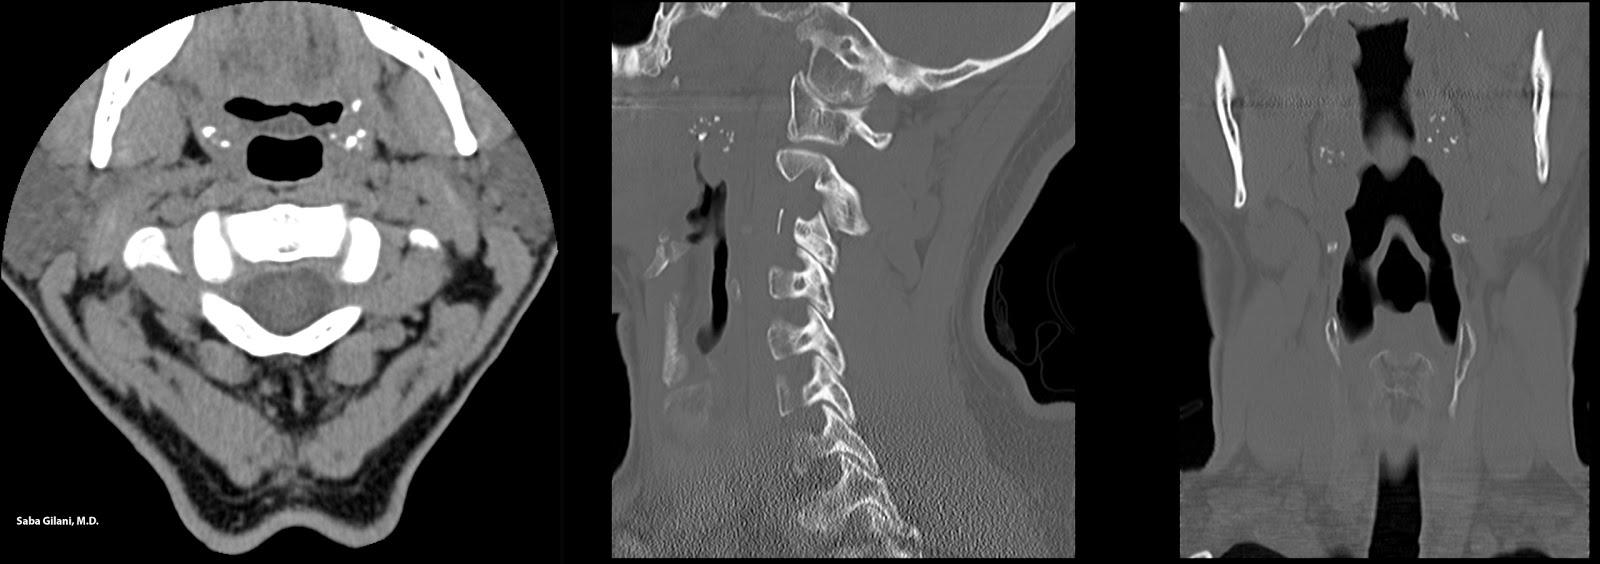 Tonsil Stones Symptoms Stiff Neck